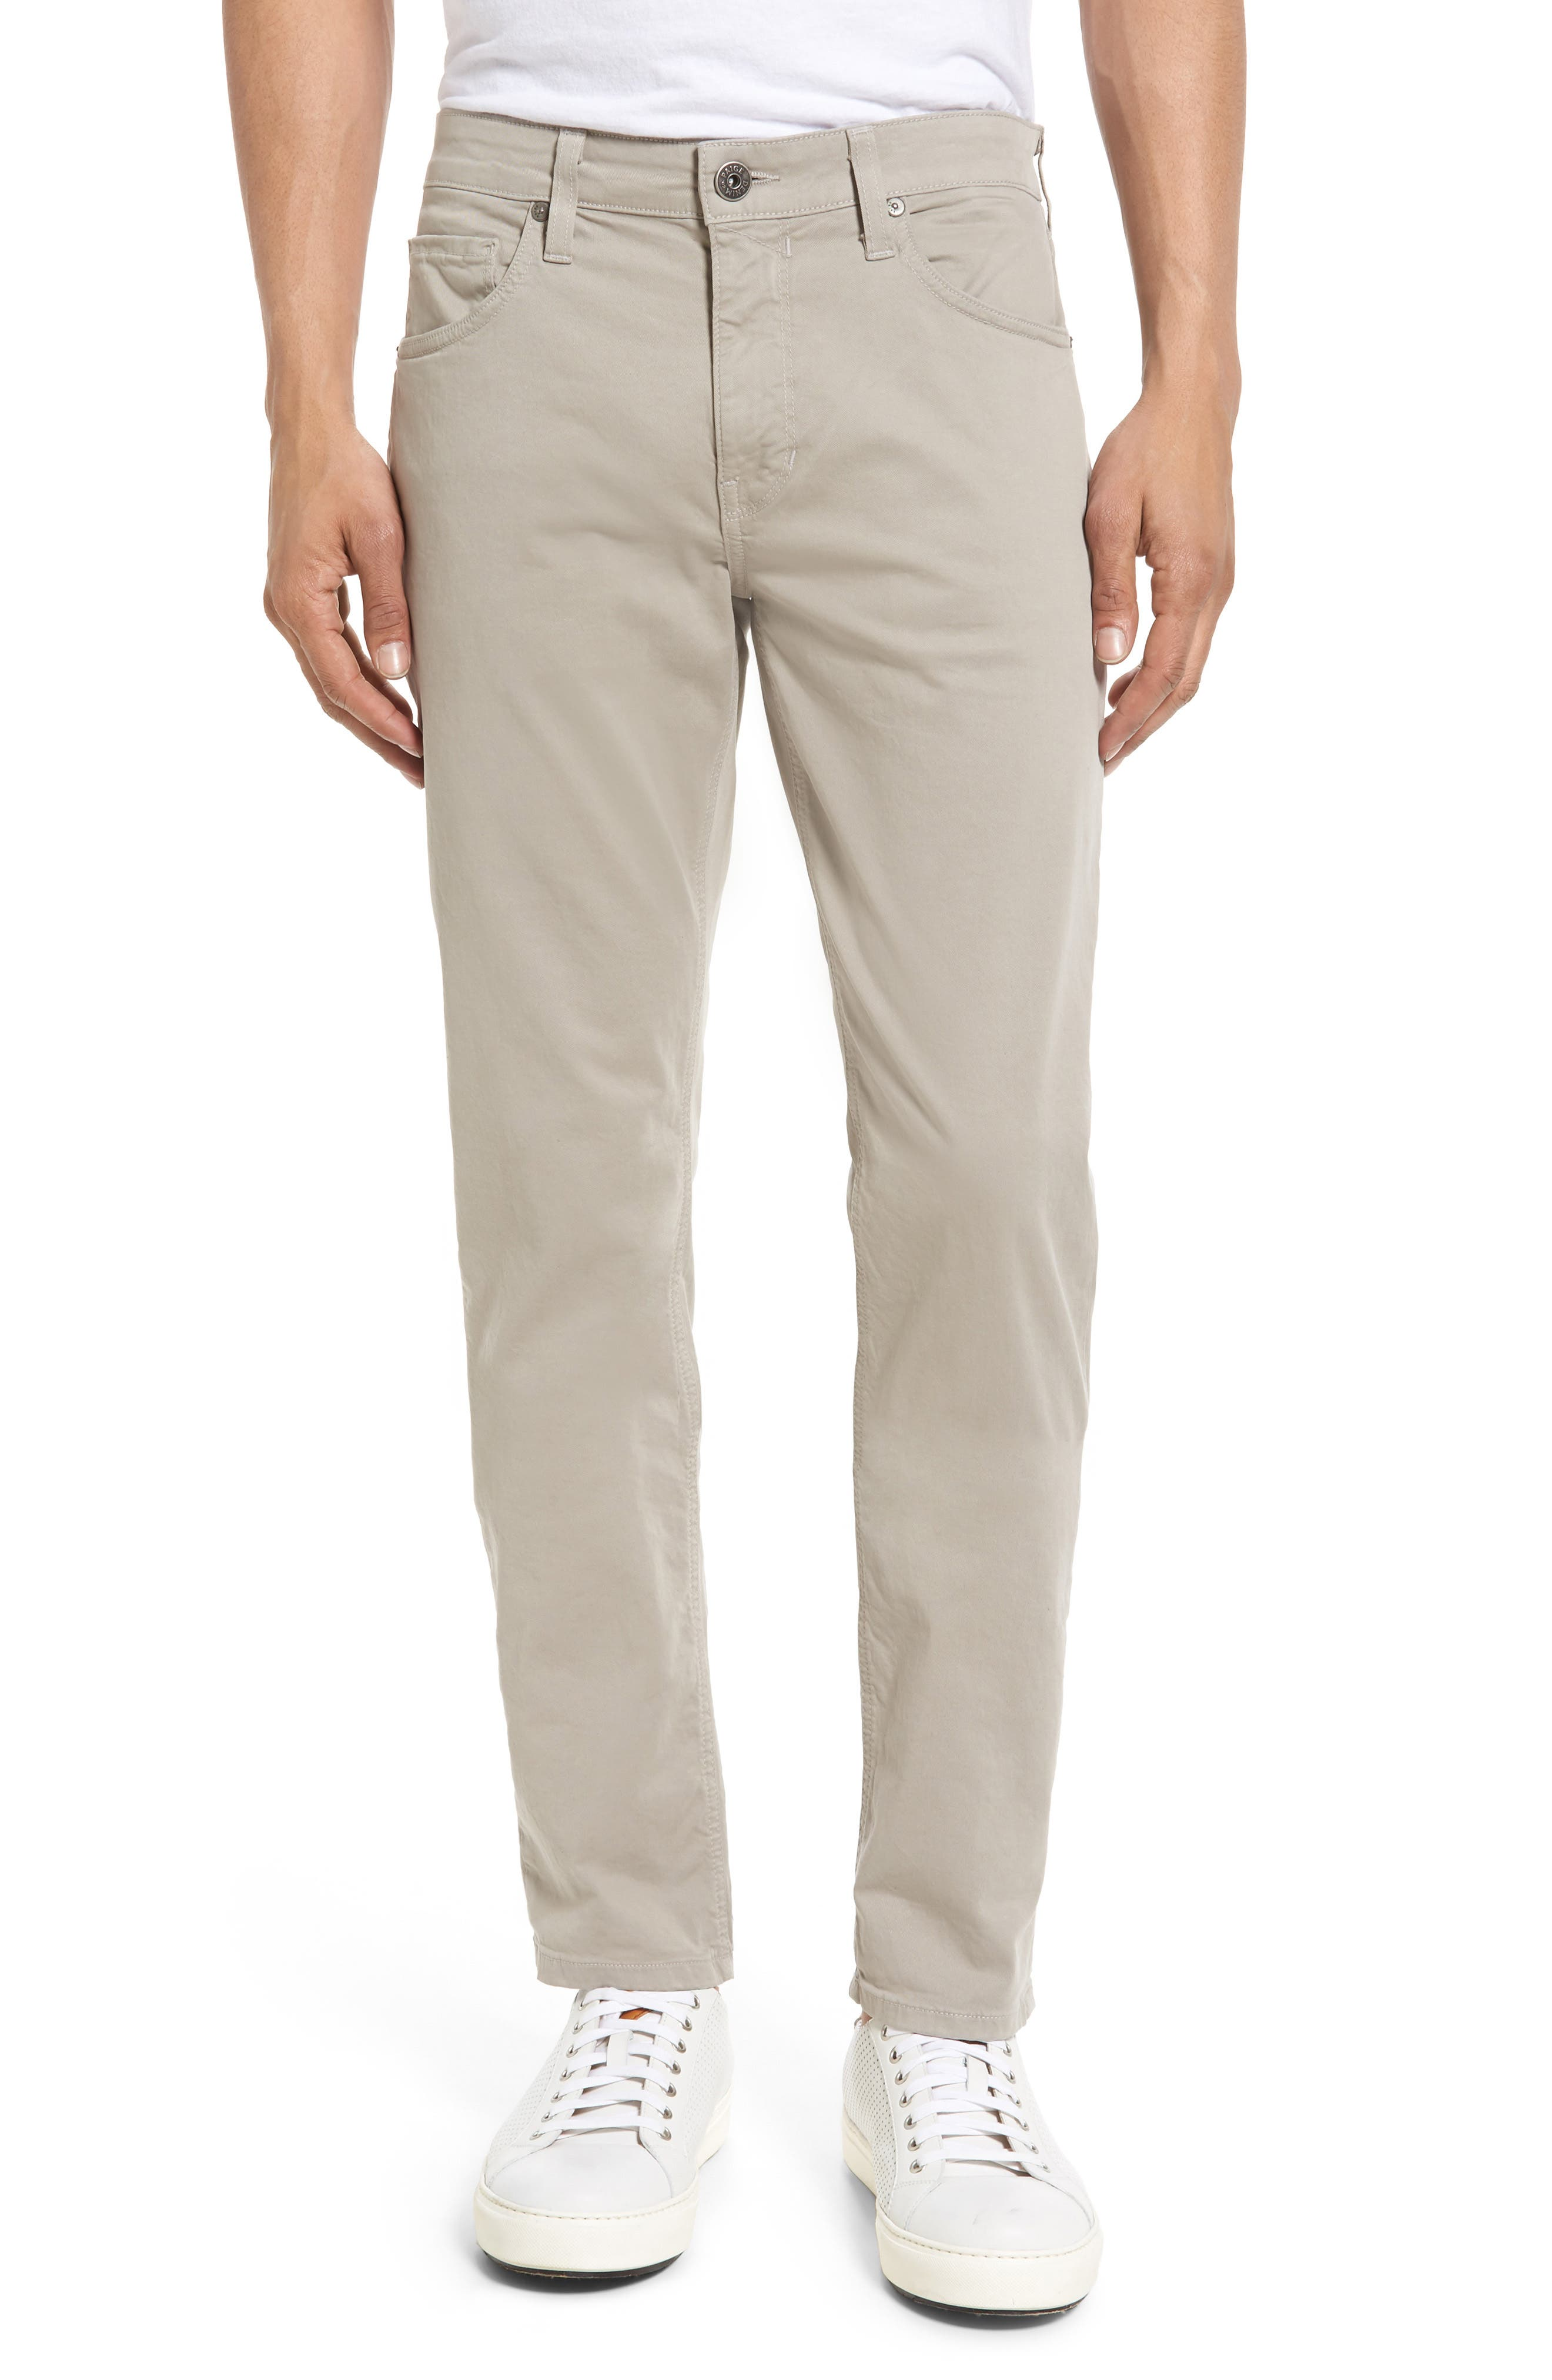 Lennox Skinny Fit Pants,                             Main thumbnail 1, color,                             Grey Coast